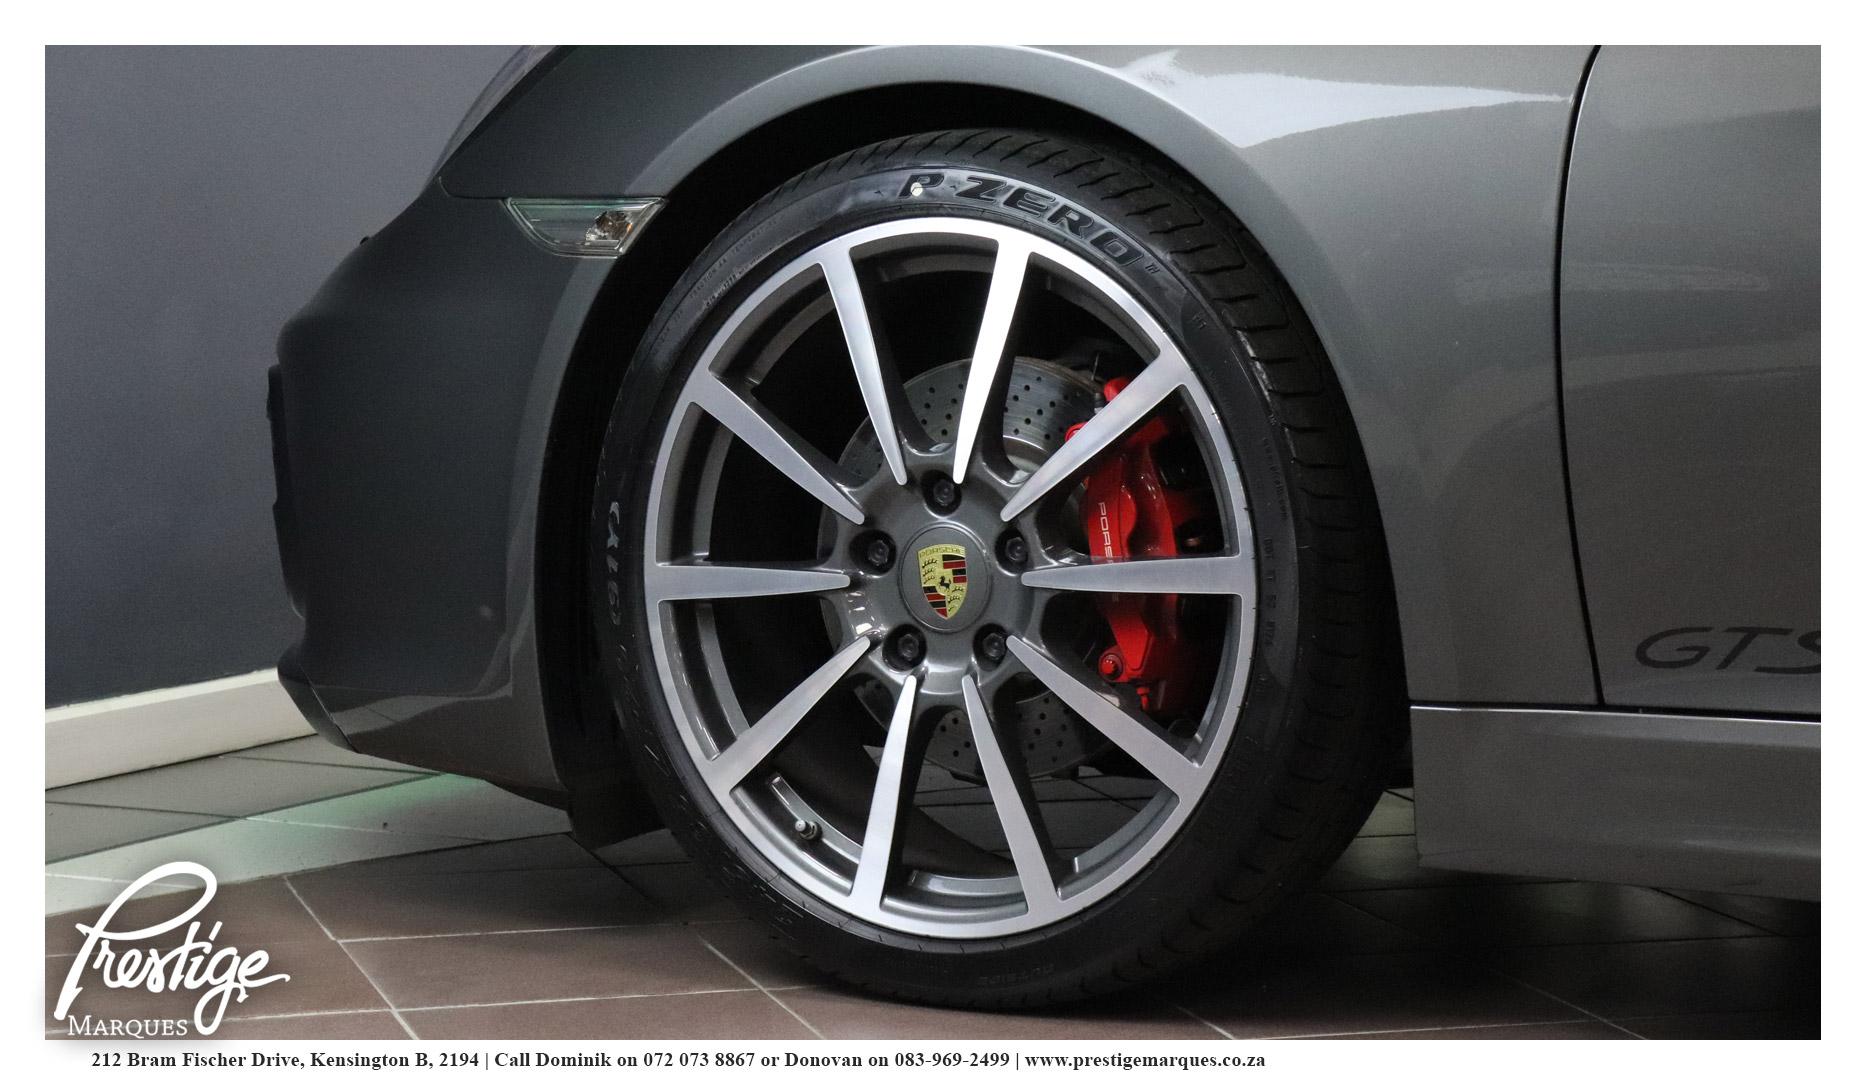 2015-Porsche-Cayman-GTS PDK-Prestige-Marques-Randburg-Sandton-12